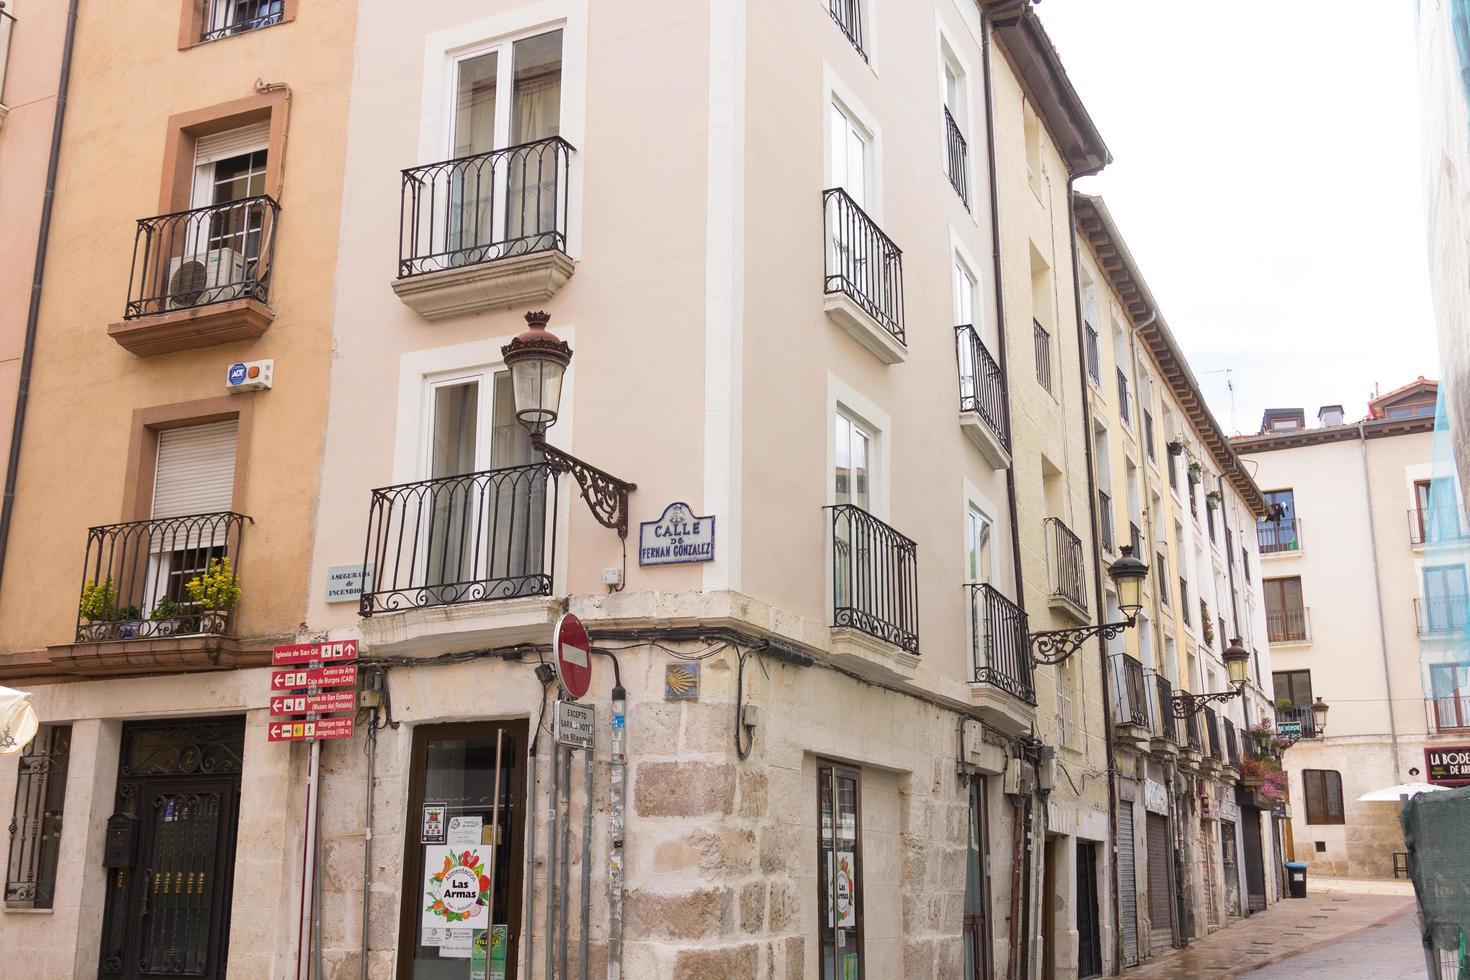 Burgos, Spain, 2021 - Buildings in Burgos photo